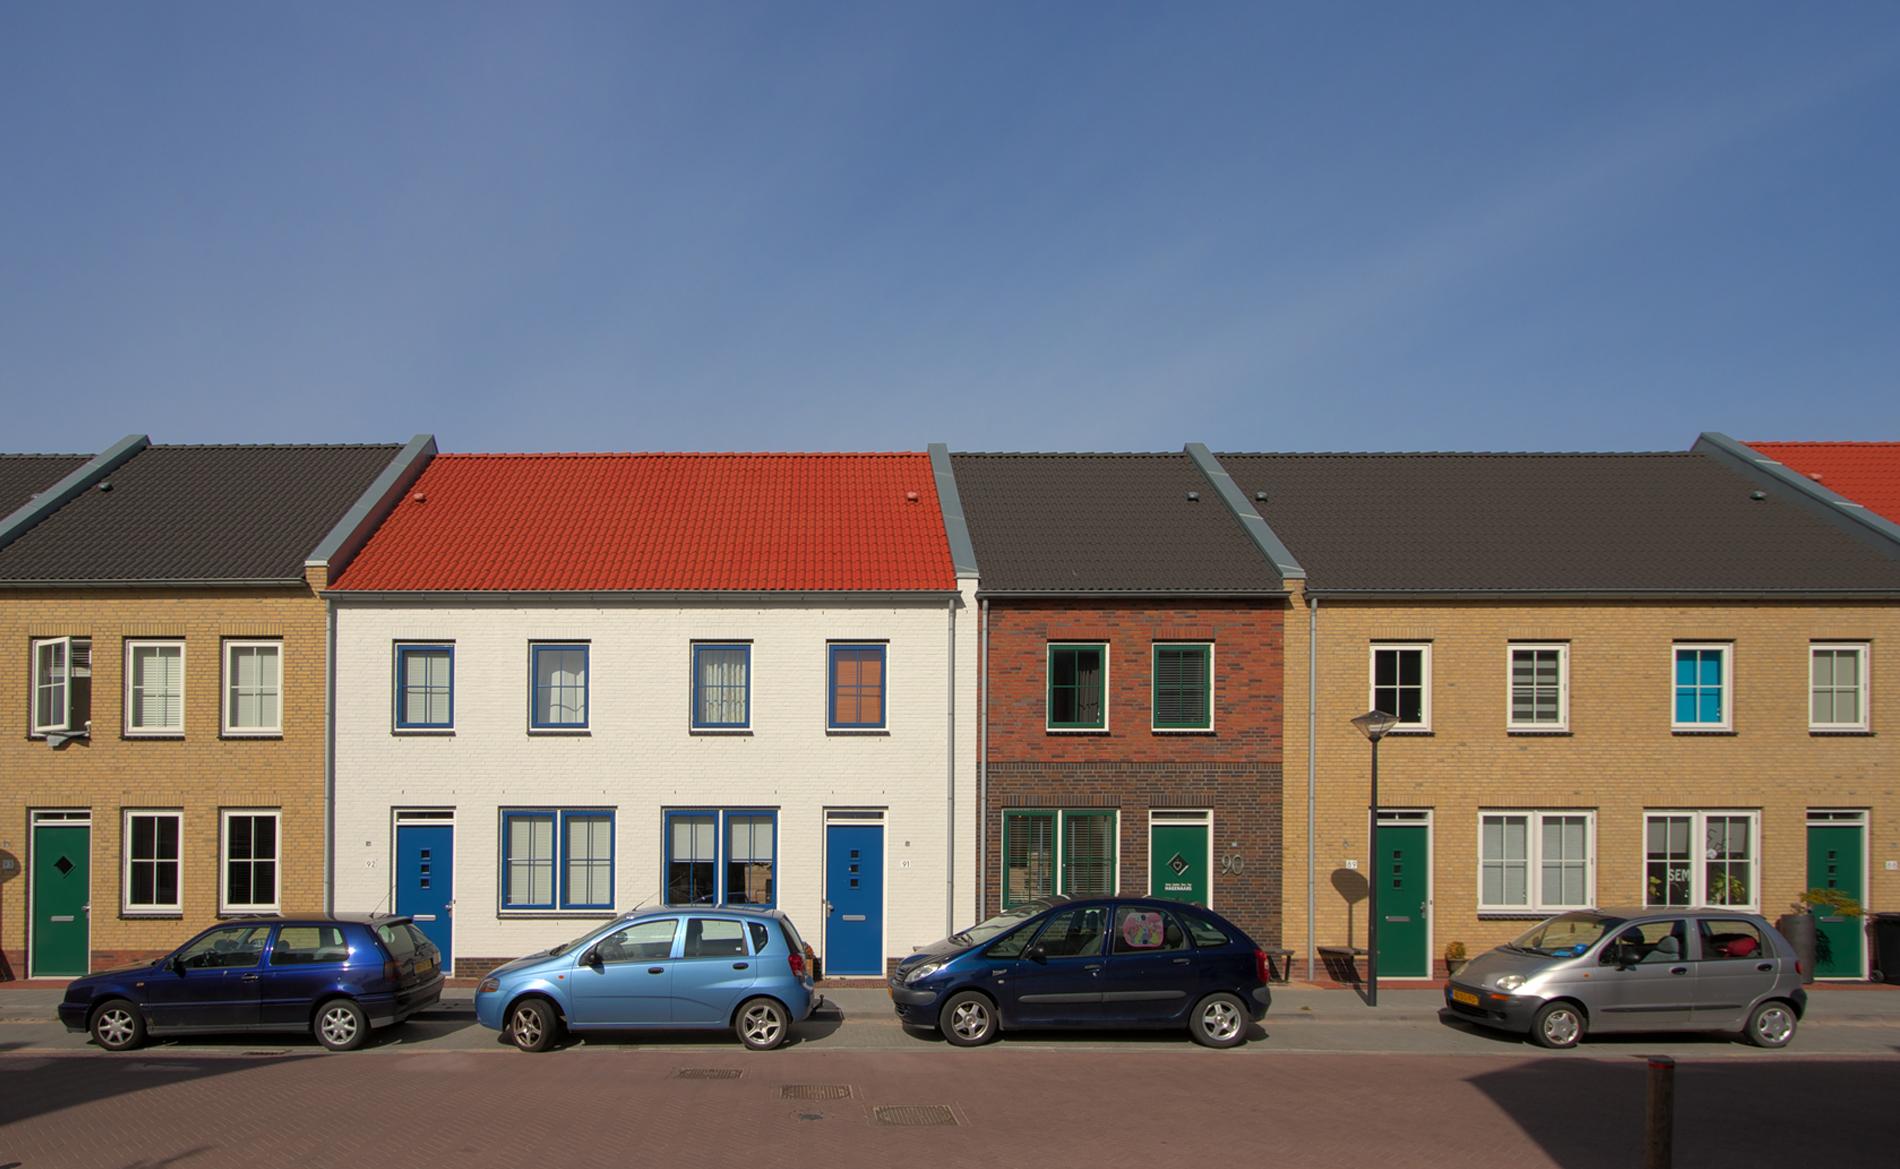 dorps bouwen architectuur wonen woningen Bangert & Oosterpolder Hoorn BBHD architecten Alkmaar